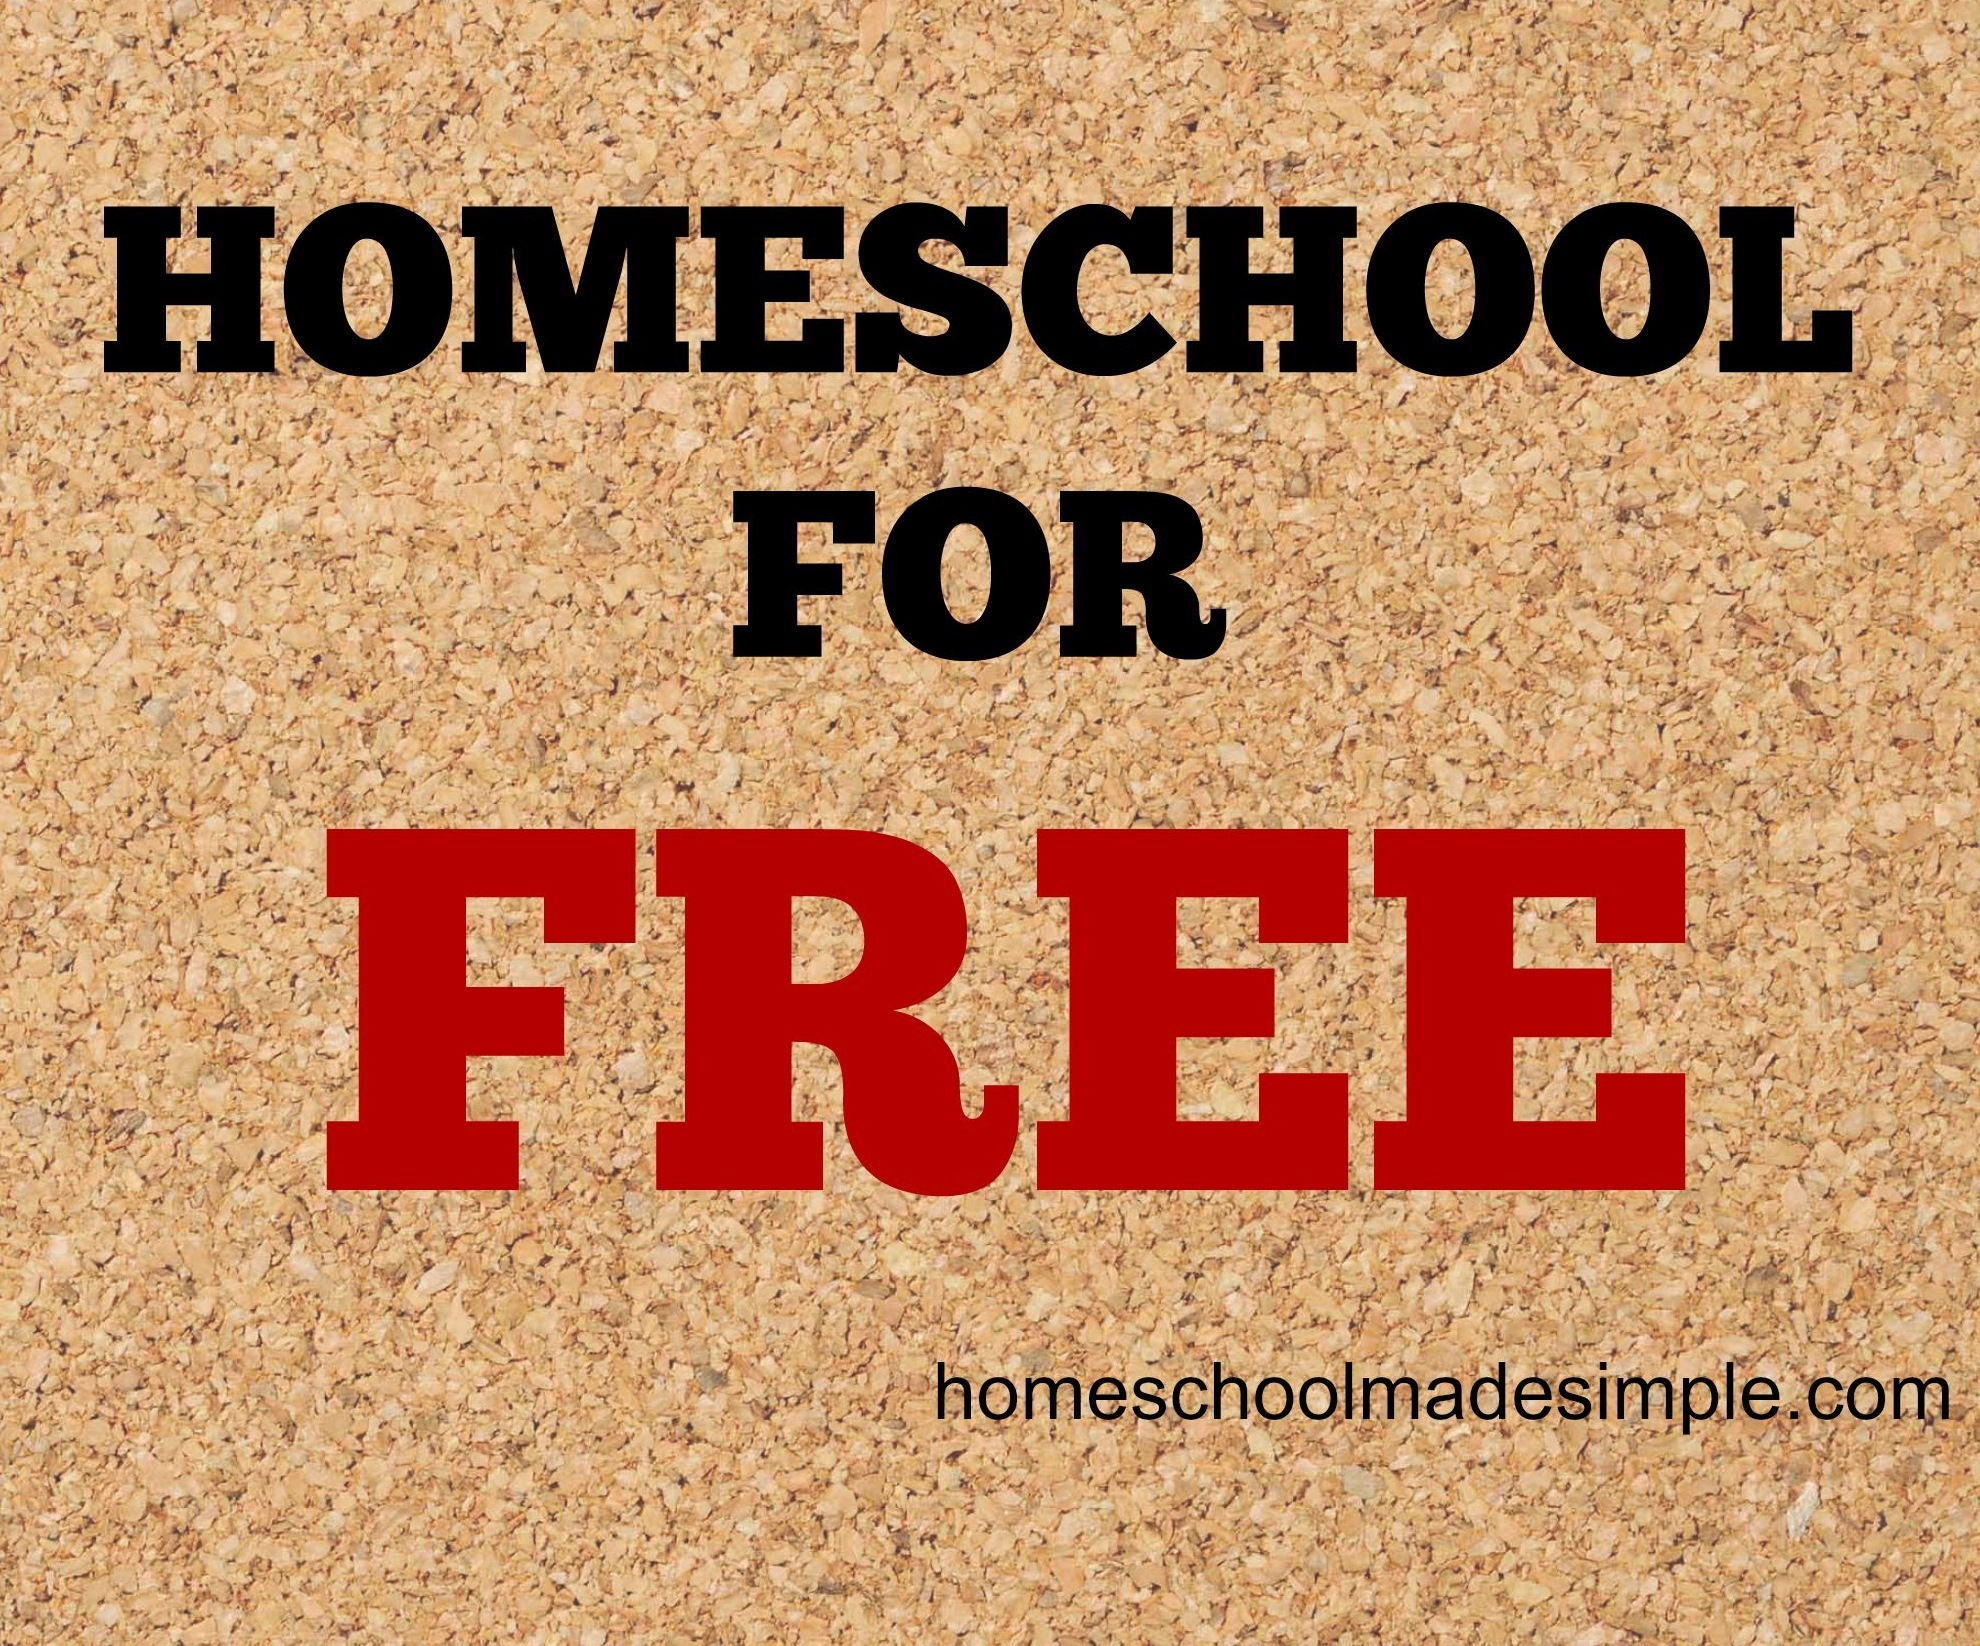 Worksheet Homeschooling Online For Free homeschooling homeschool made simple for free